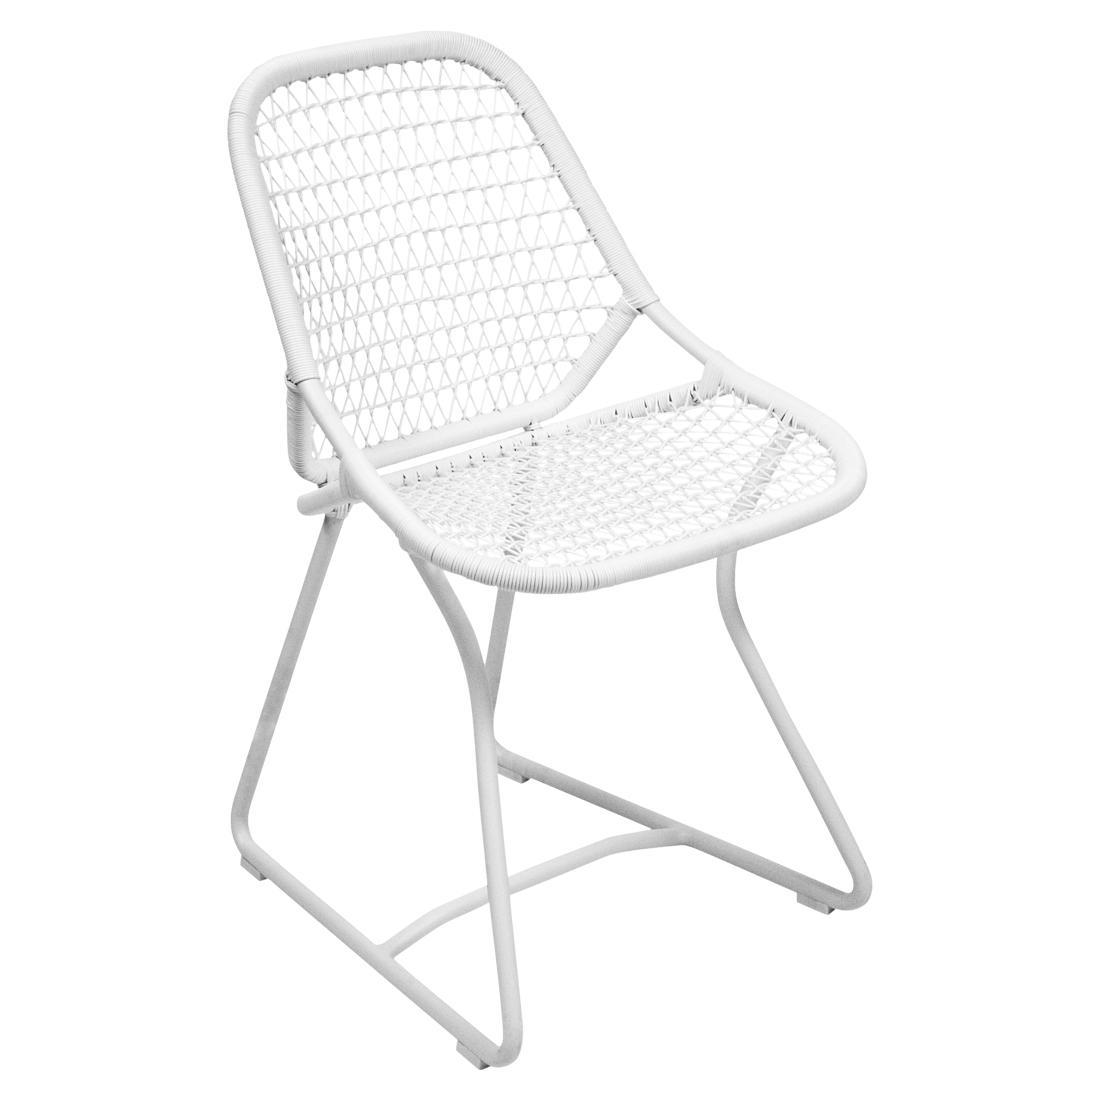 Remarkable Sixties Dining Chair Lamtechconsult Wood Chair Design Ideas Lamtechconsultcom